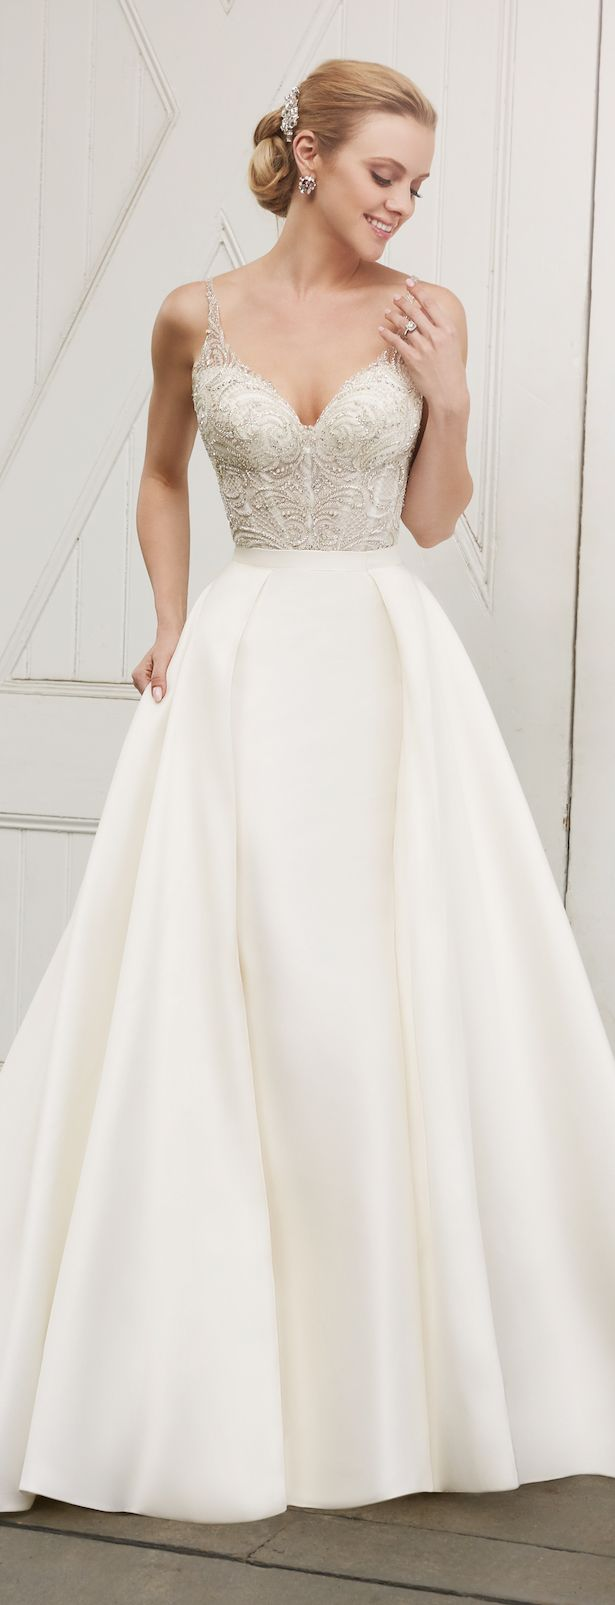 472 best Wedding Dresses & Accessories images on Pinterest ...